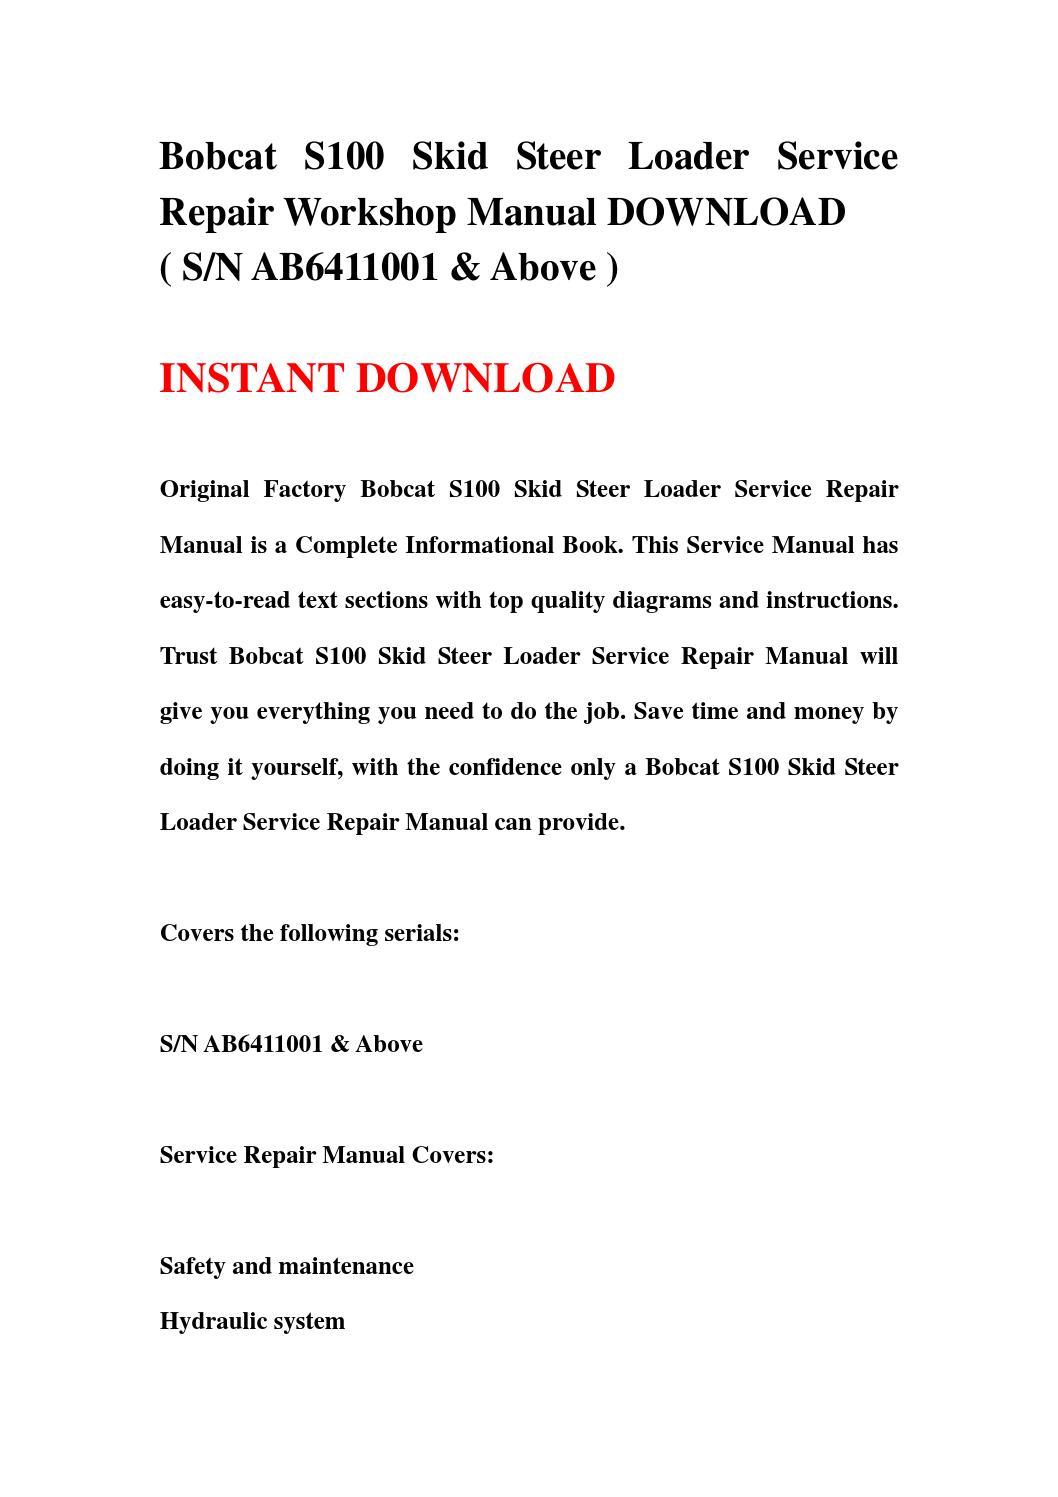 bobcat s100 skid steer loader service repair workshop manual rh issuu com Bobcat Skid Steer Wiring Diagram T650 Bobcat Wiring Diagram